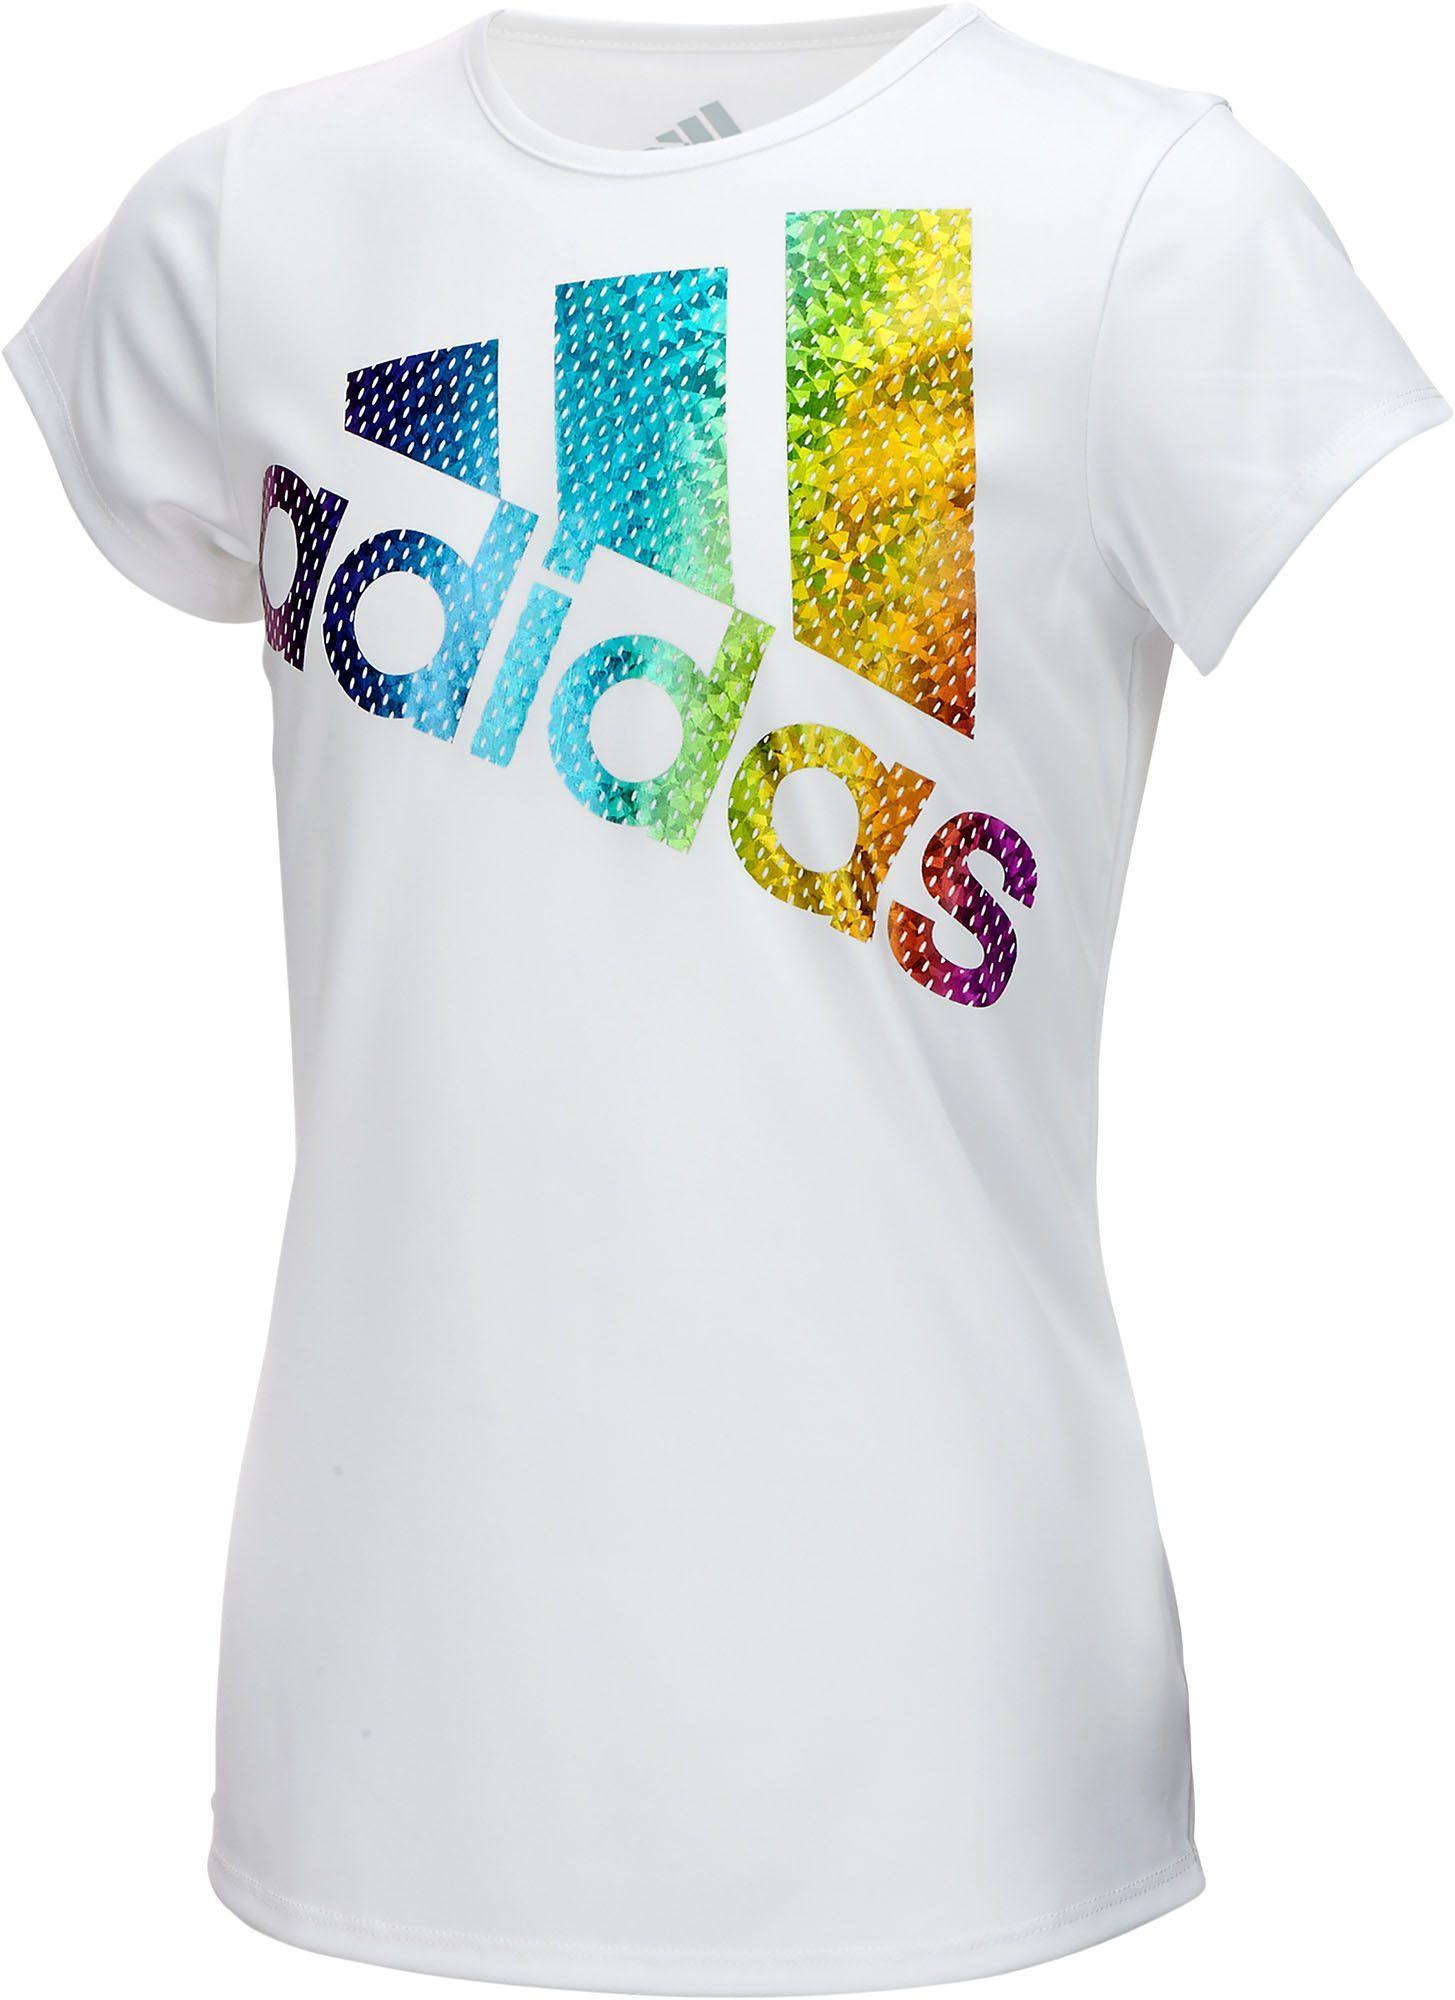 New Adidas Girls/' Short Sleeve Graphic Tee Shirts